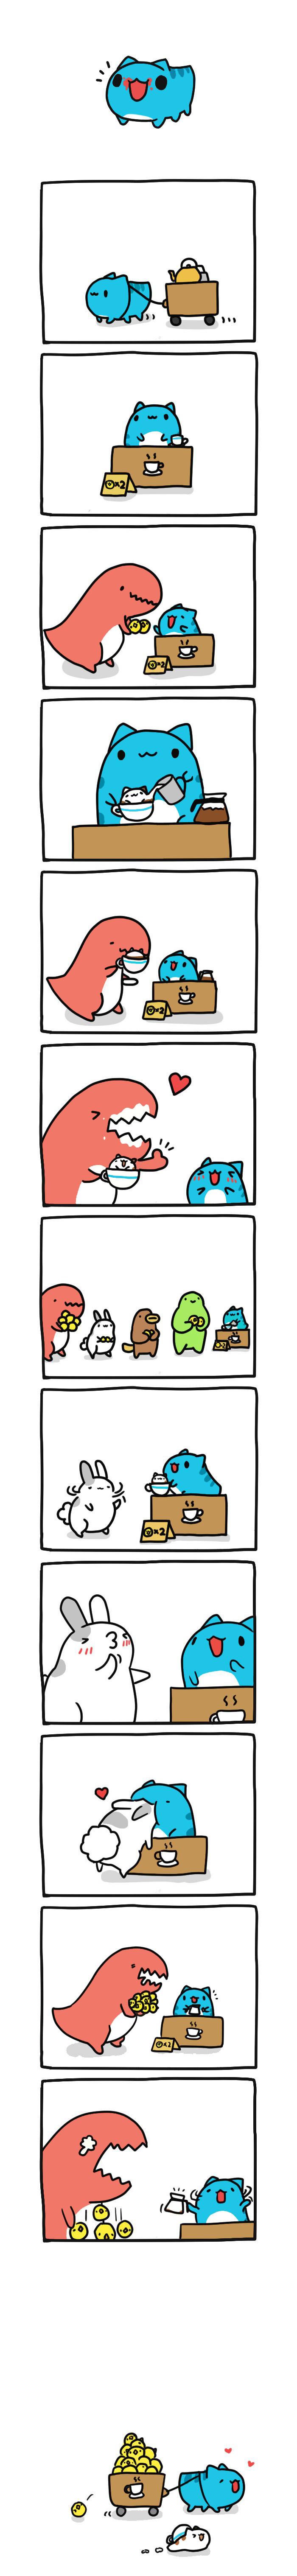 https://r1.ninemanga.com/comics/pic2/40/27944/283364/1454167314347.jpg Page 1